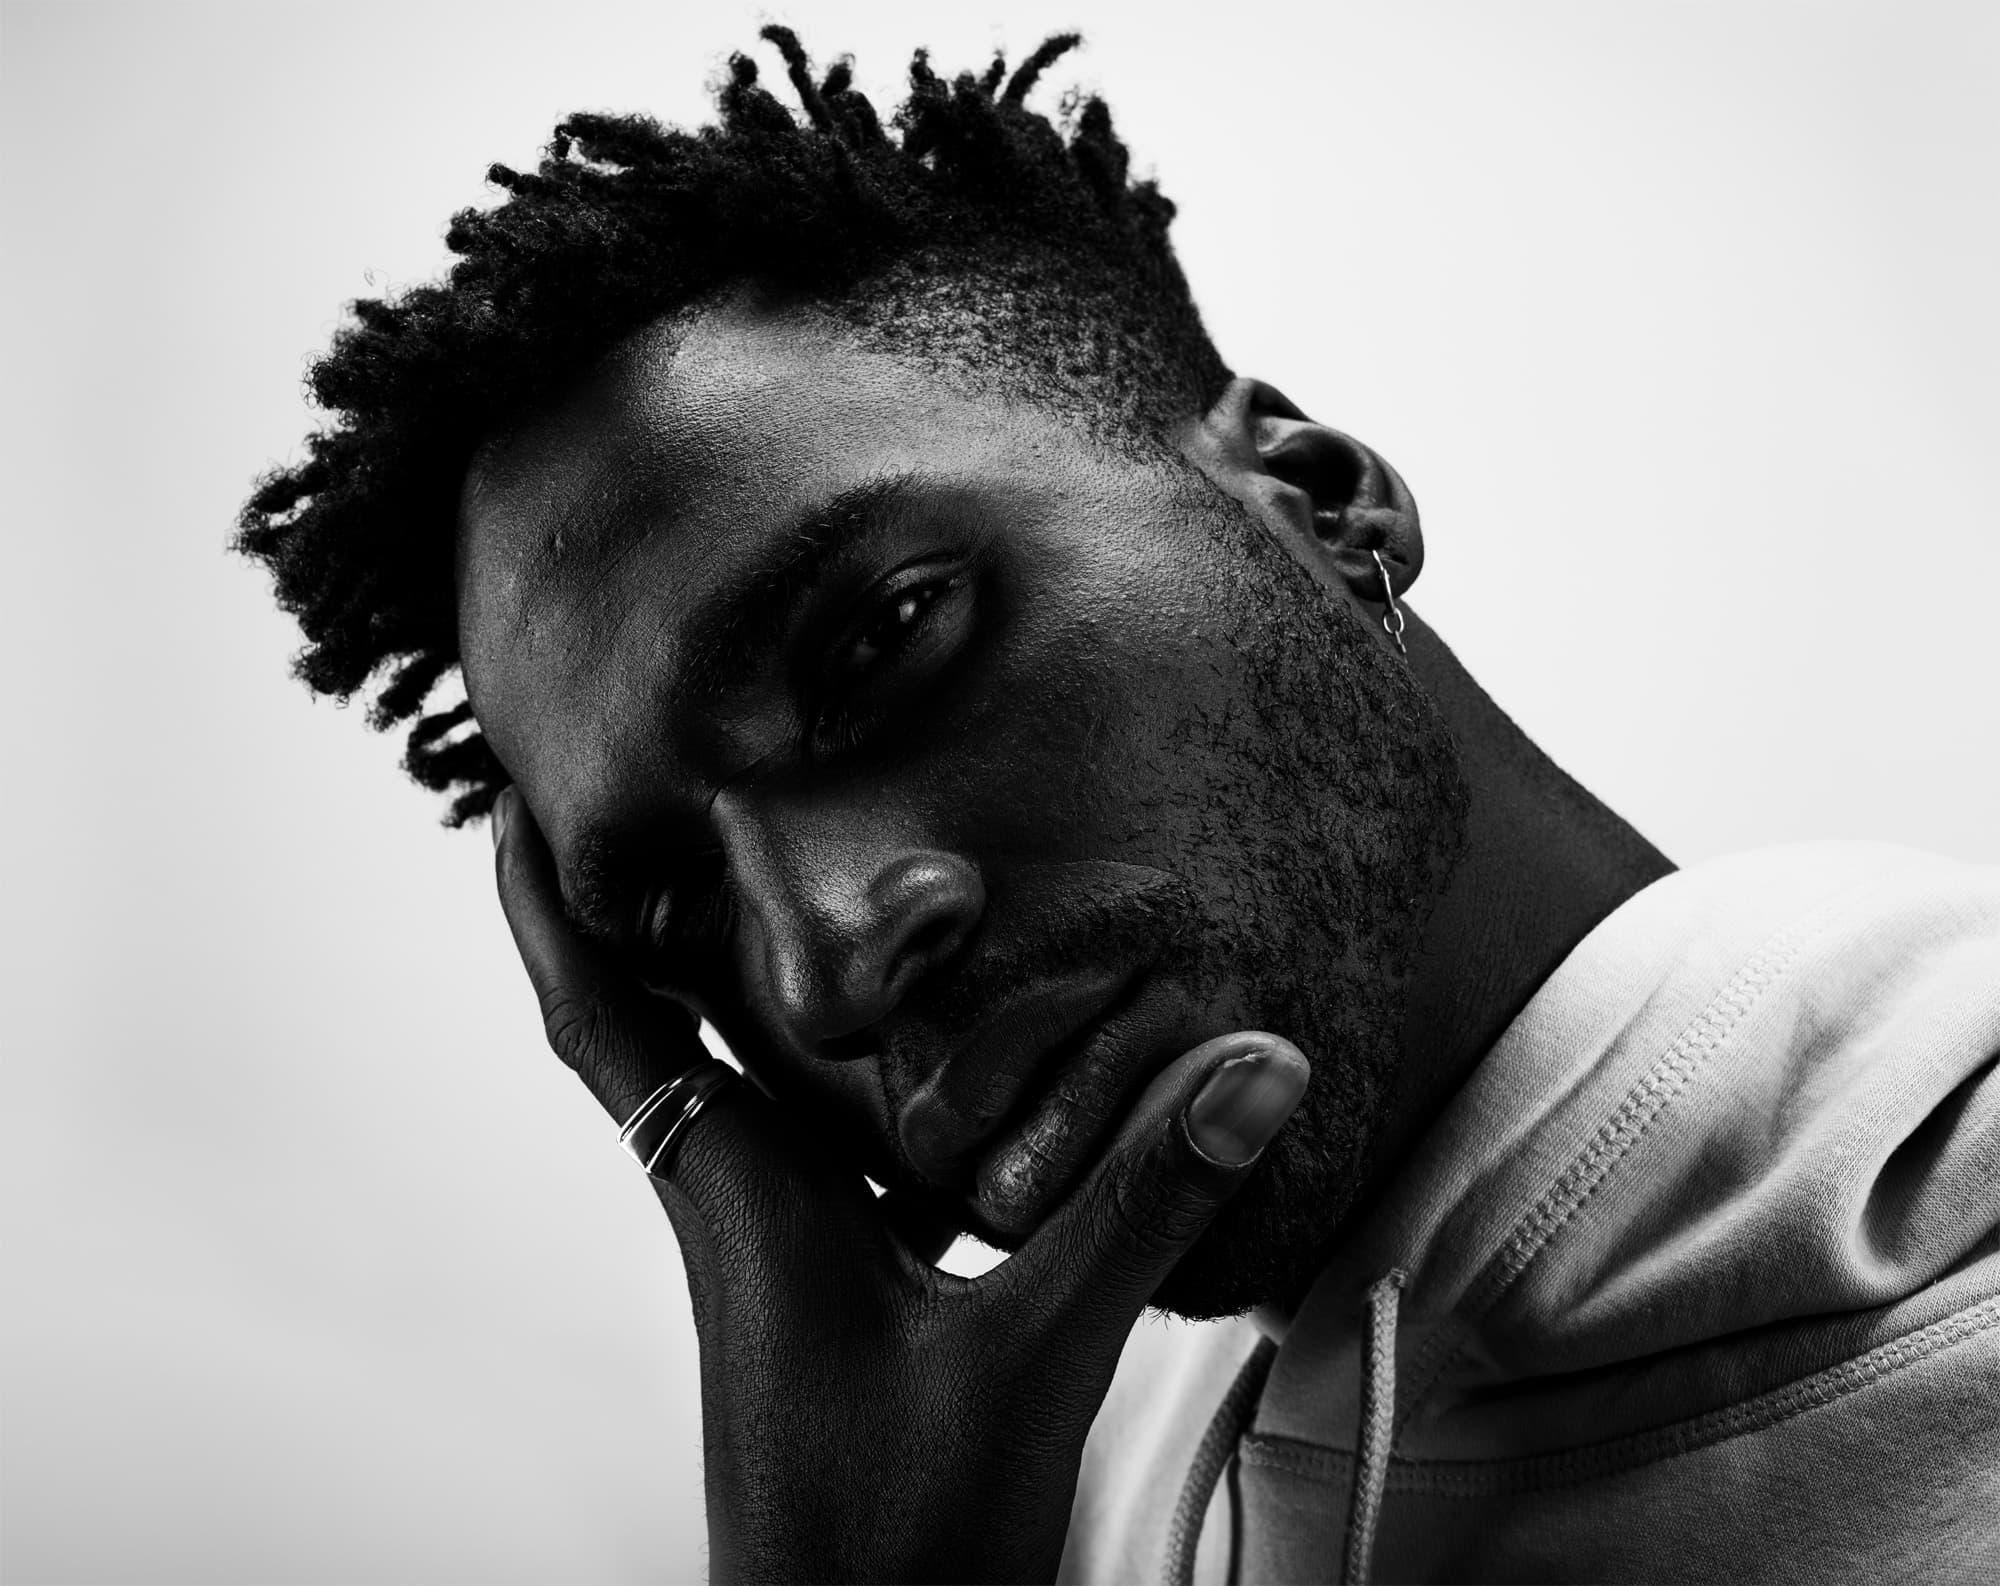 webseite-HolgerAltgeld-Pascal-Nkongo-portraits-102